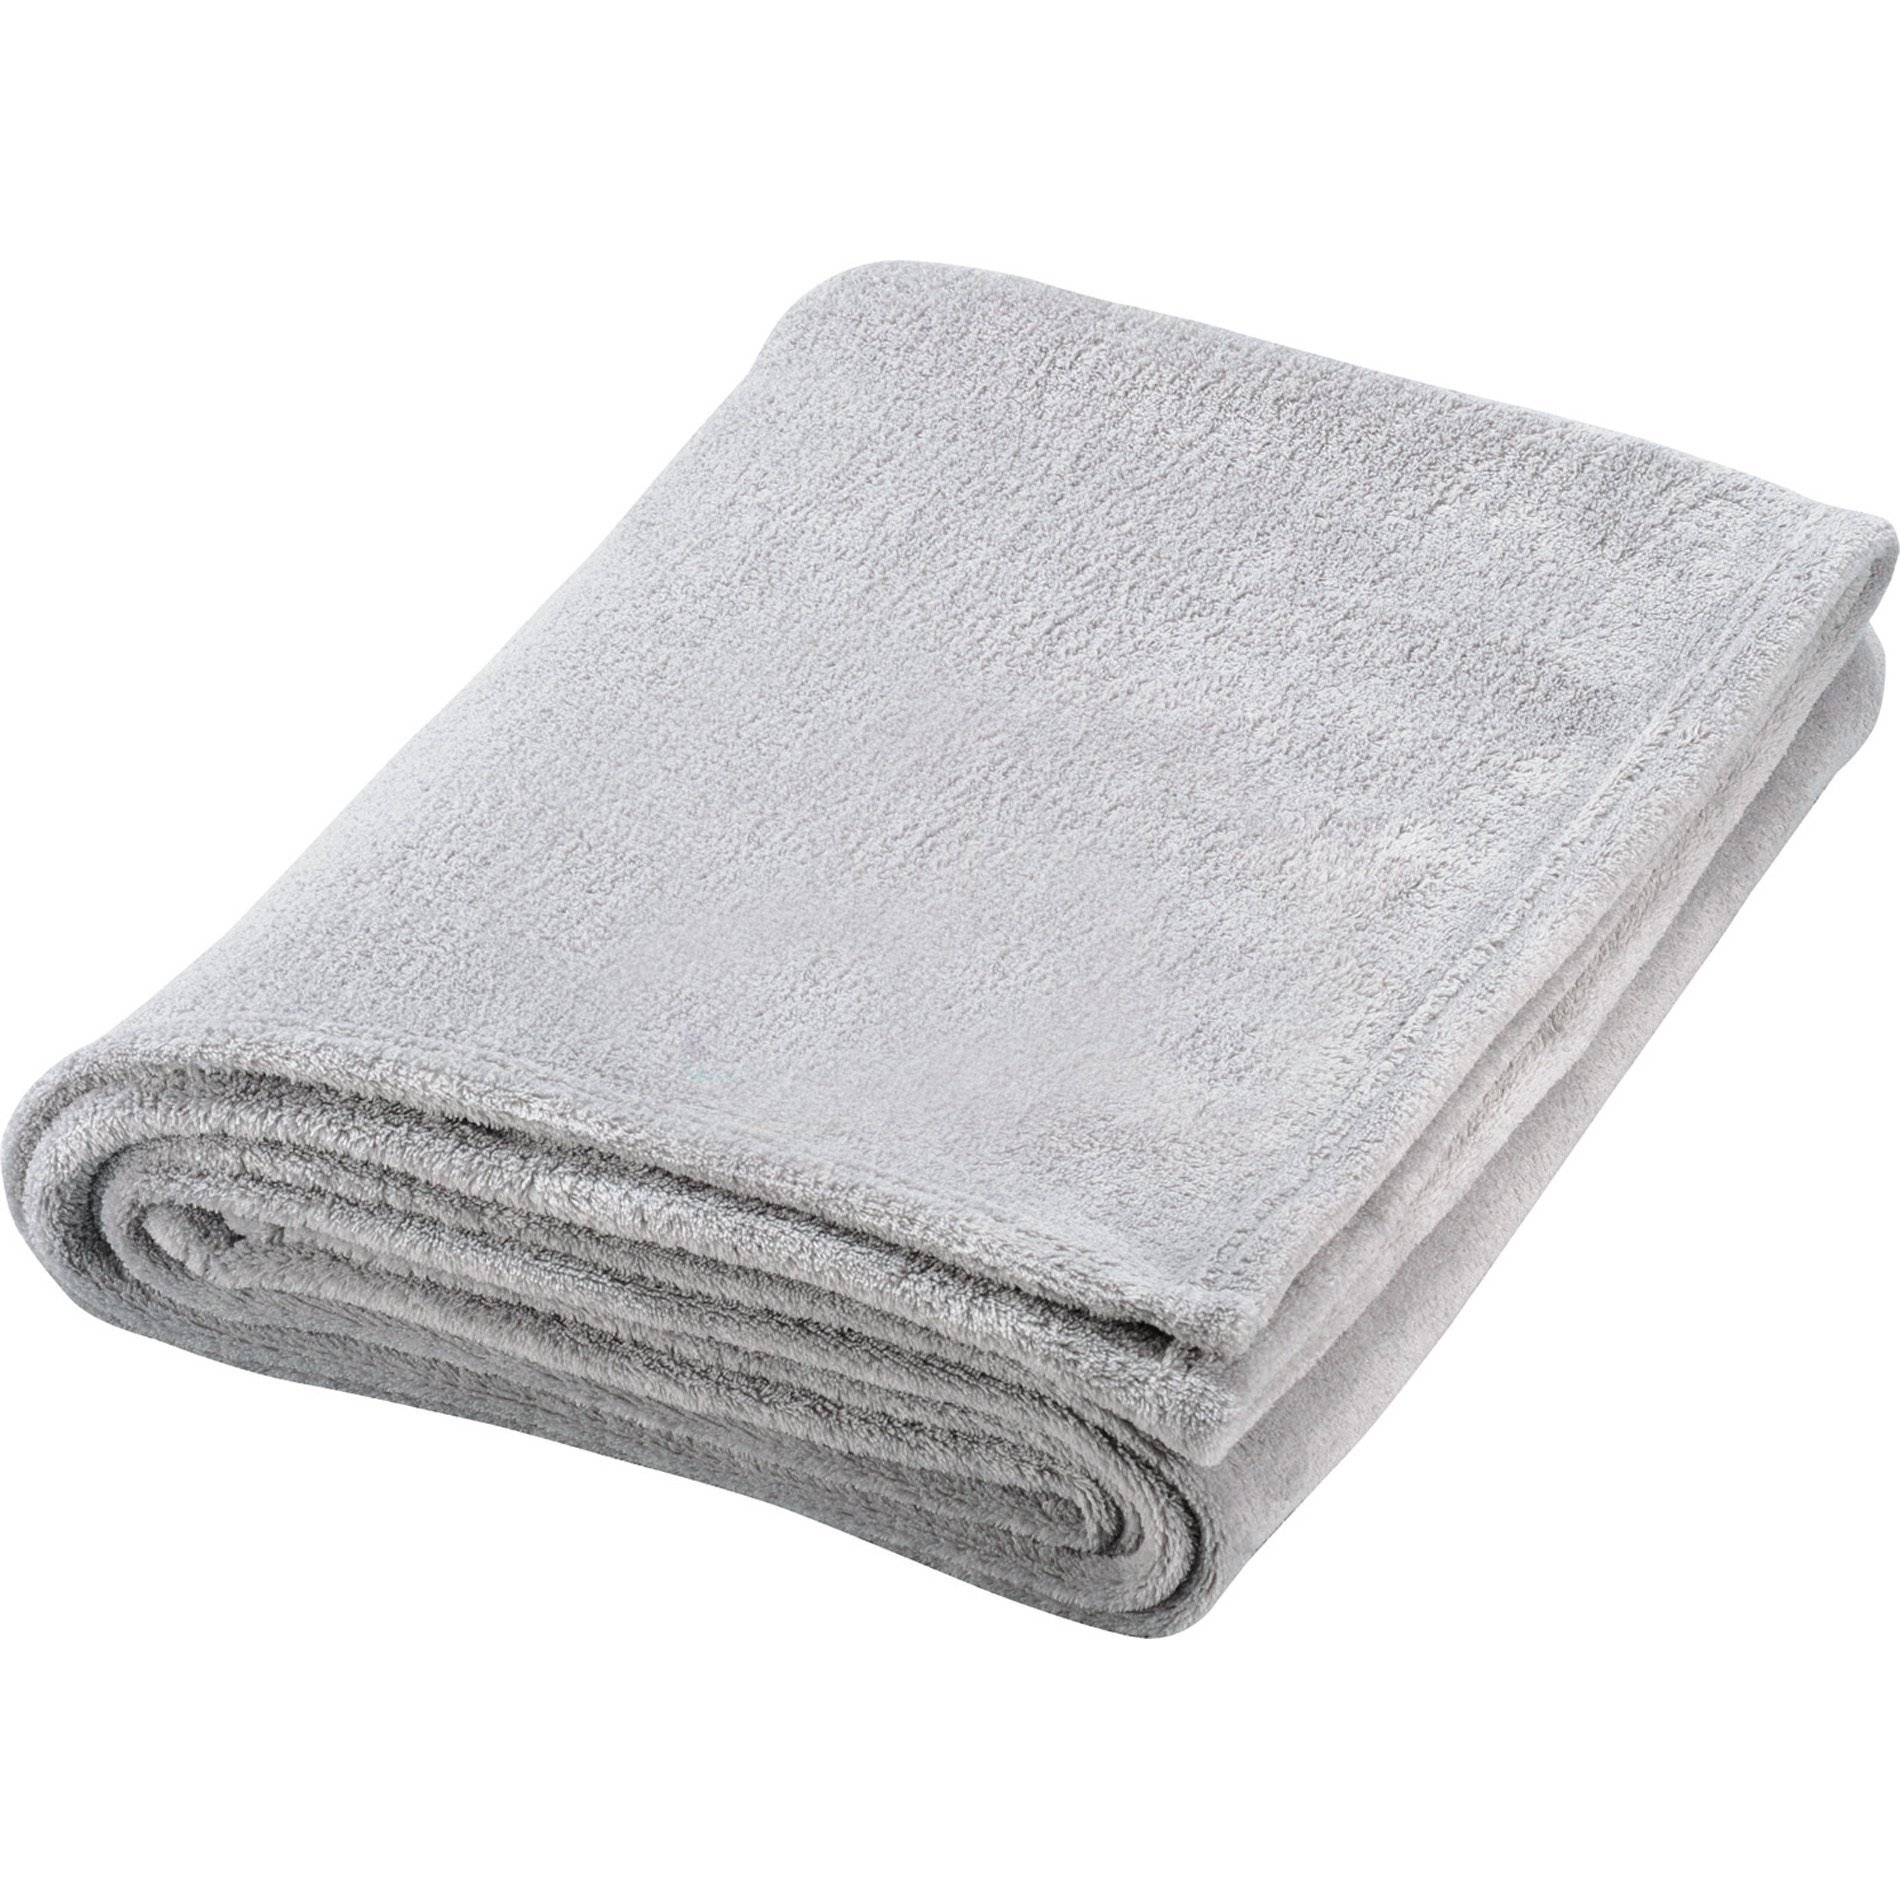 "Micro Coral Plush Blanket, 50"" x 60"""